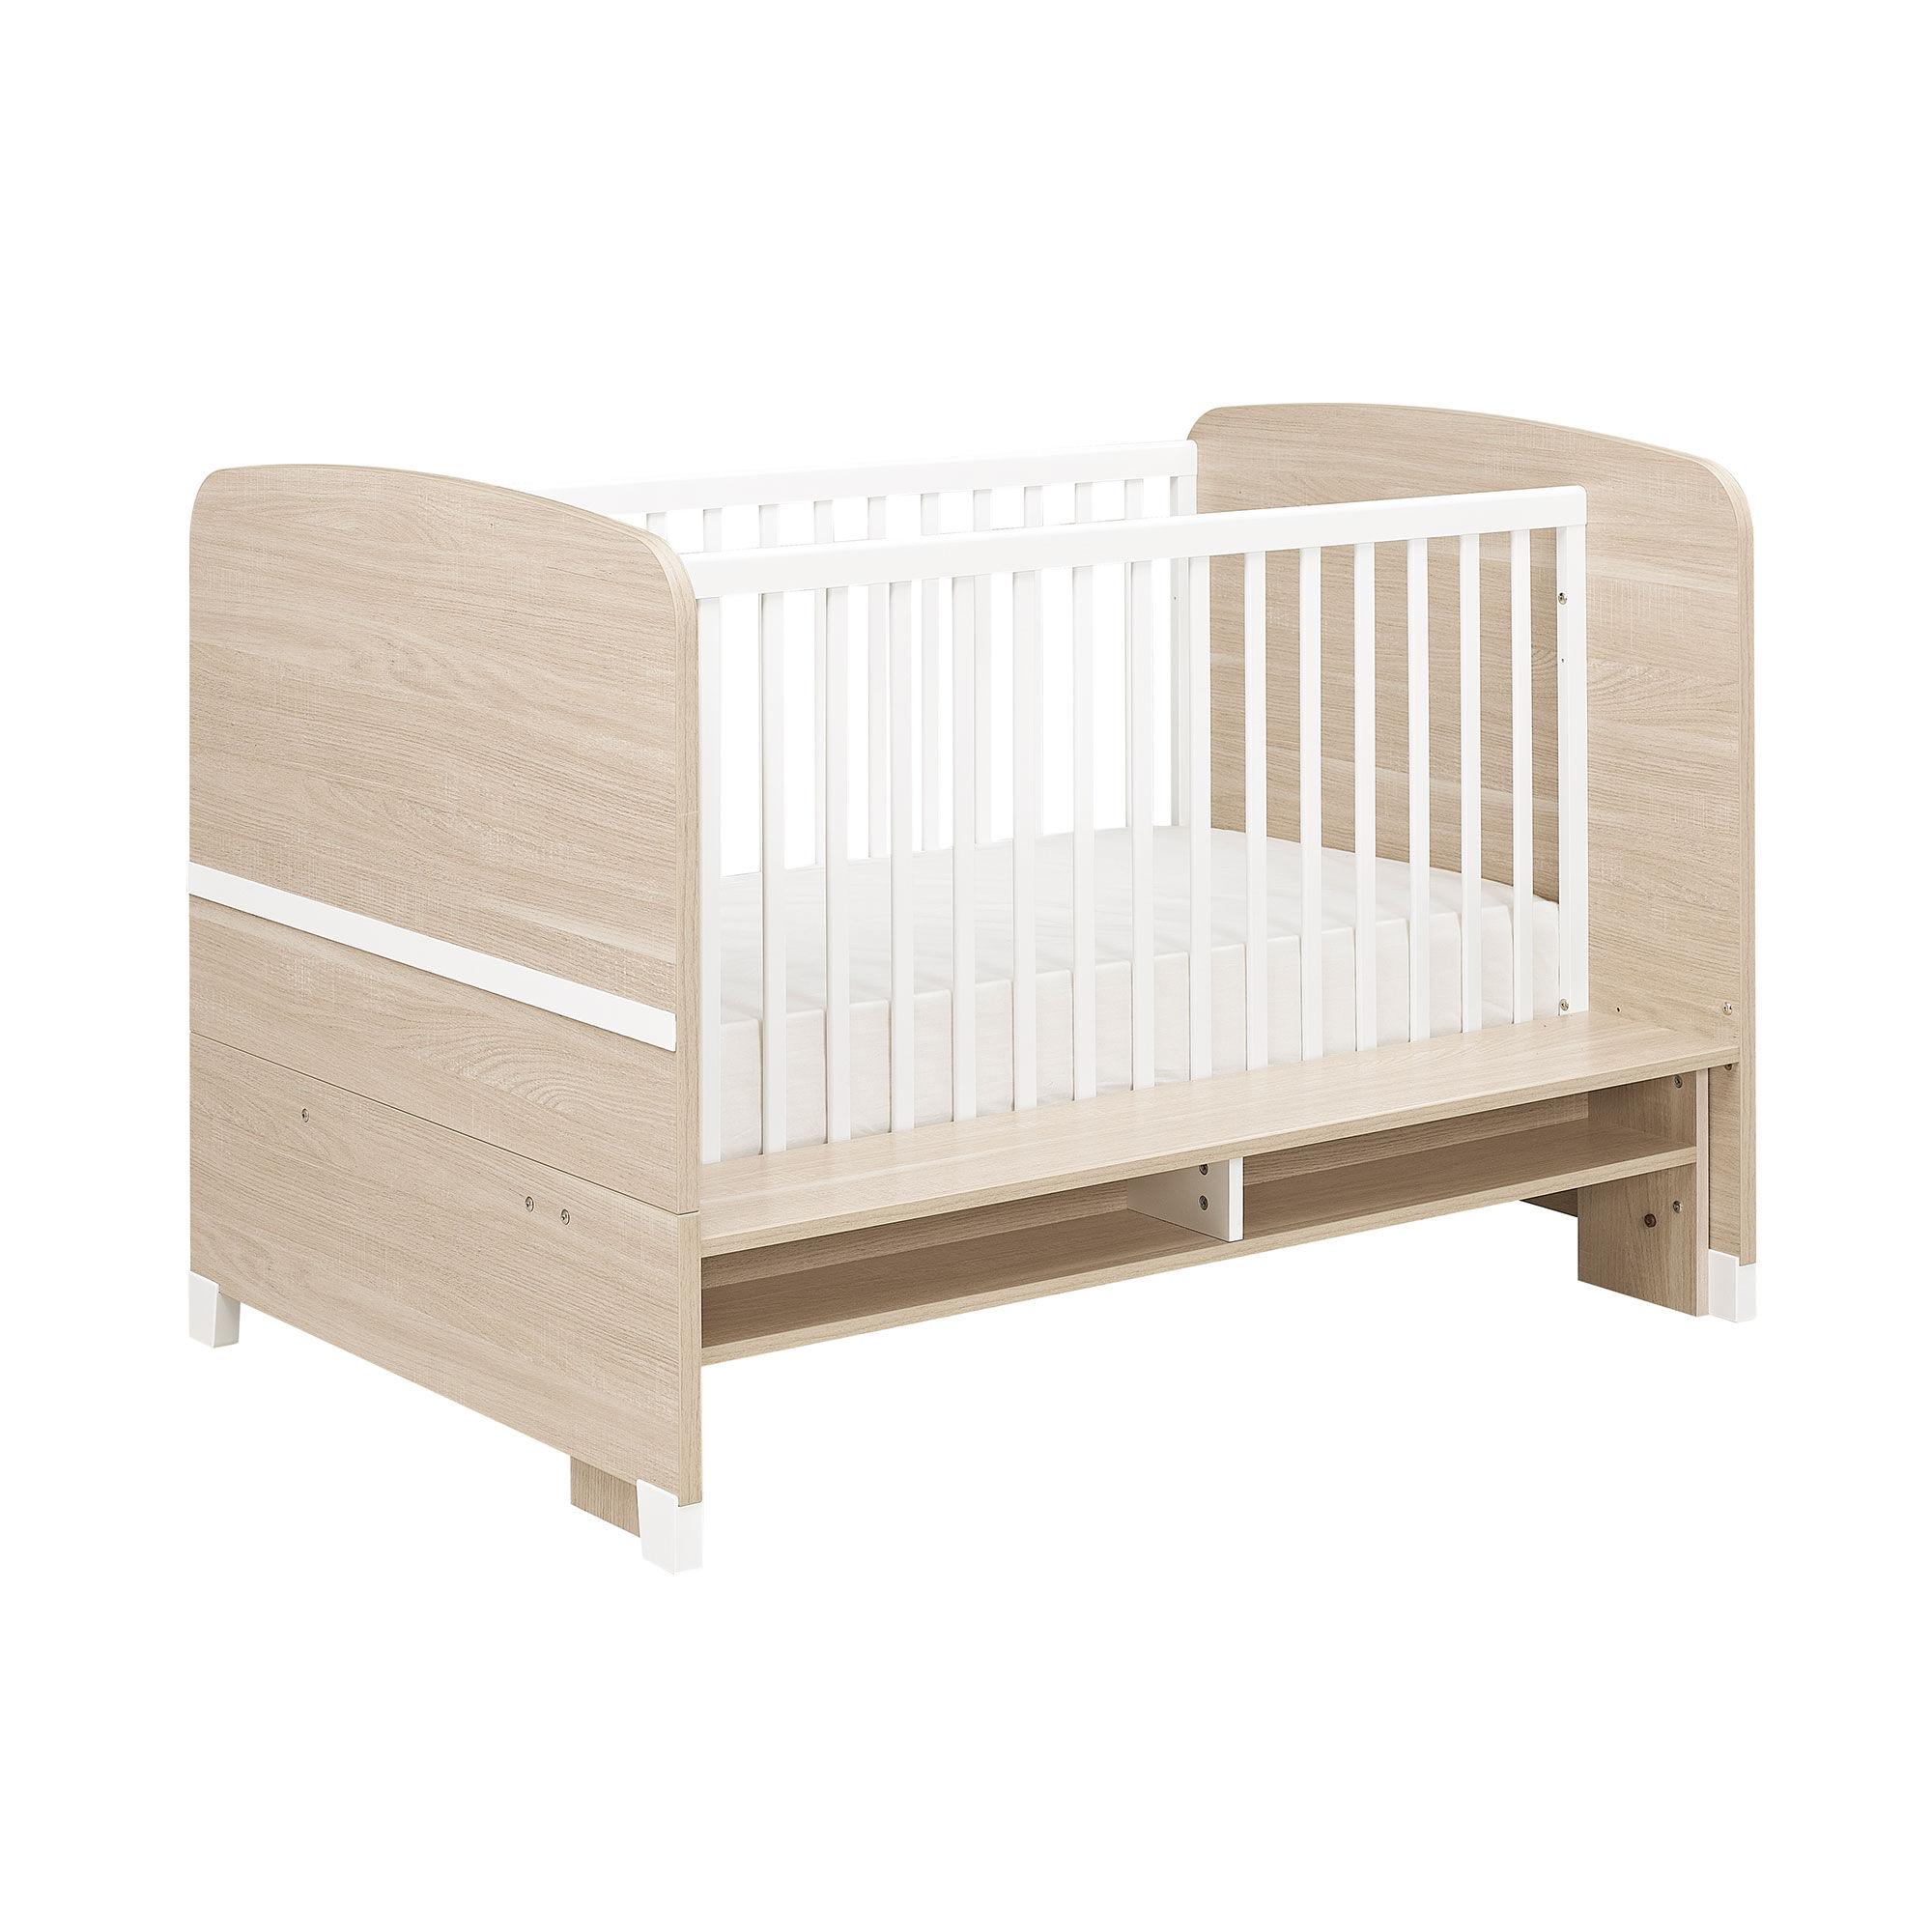 Lit bébé évolutif 70x140 cm naturel et blanc - GAYLOR